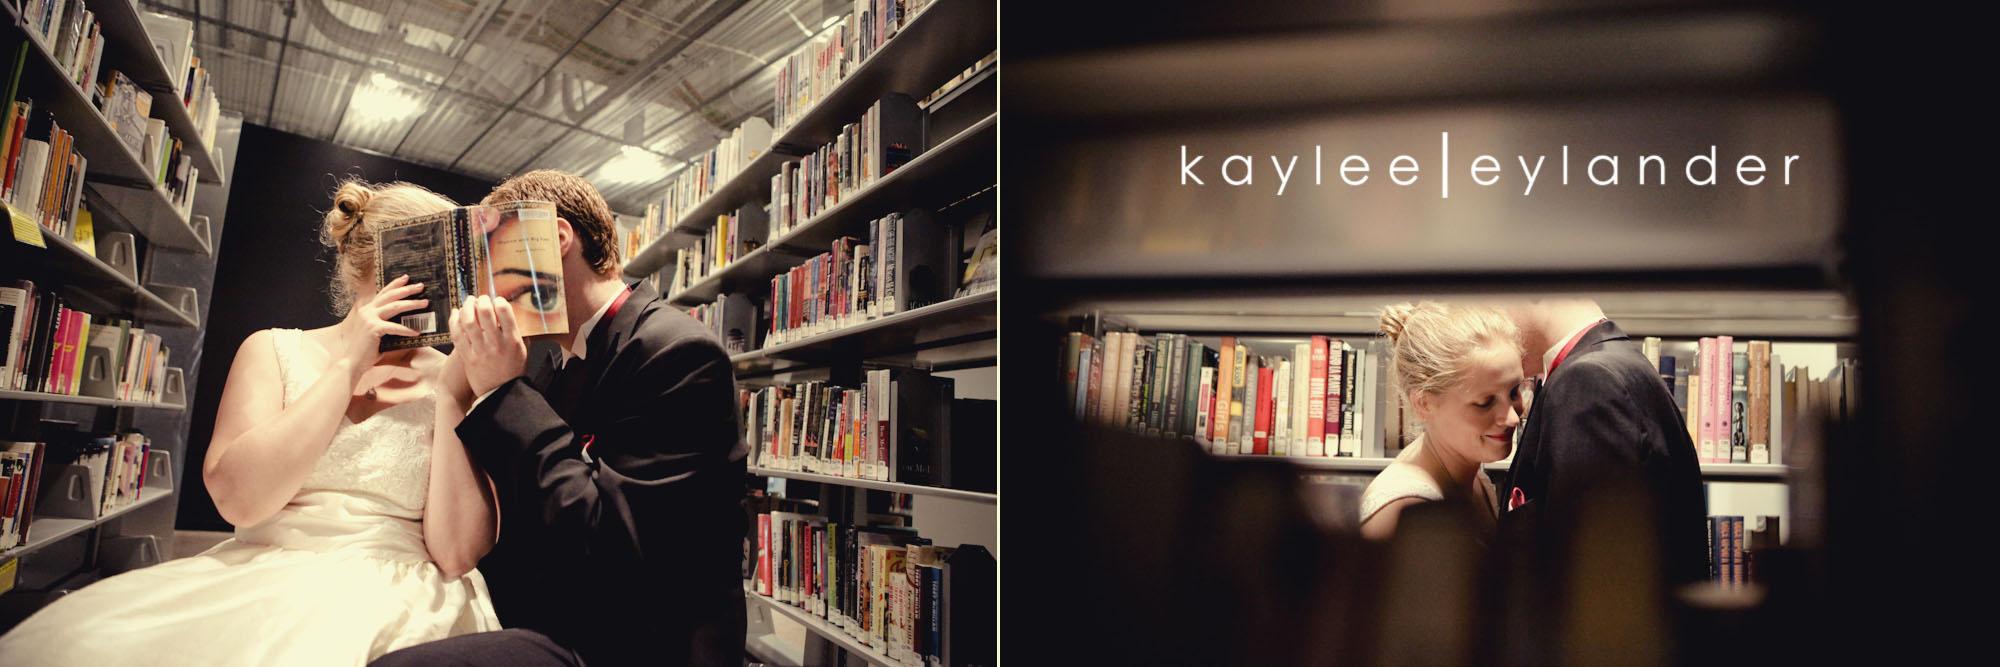 wedding seattle public library downtown seattle